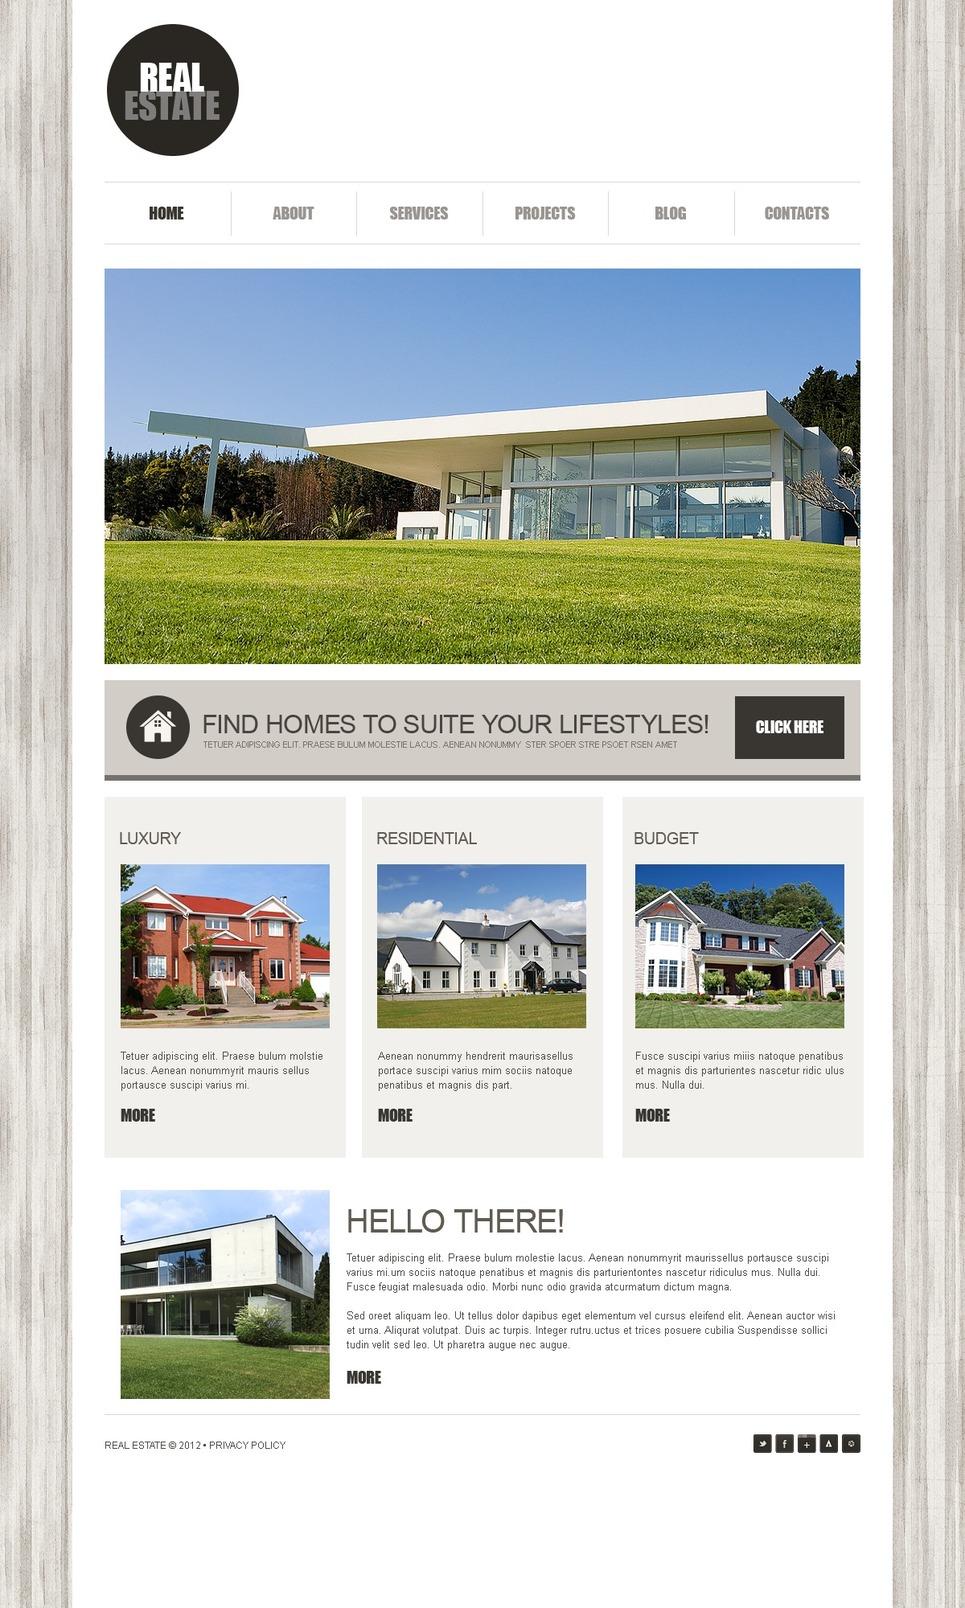 Real Estate Joomla Template New Screenshots BIG